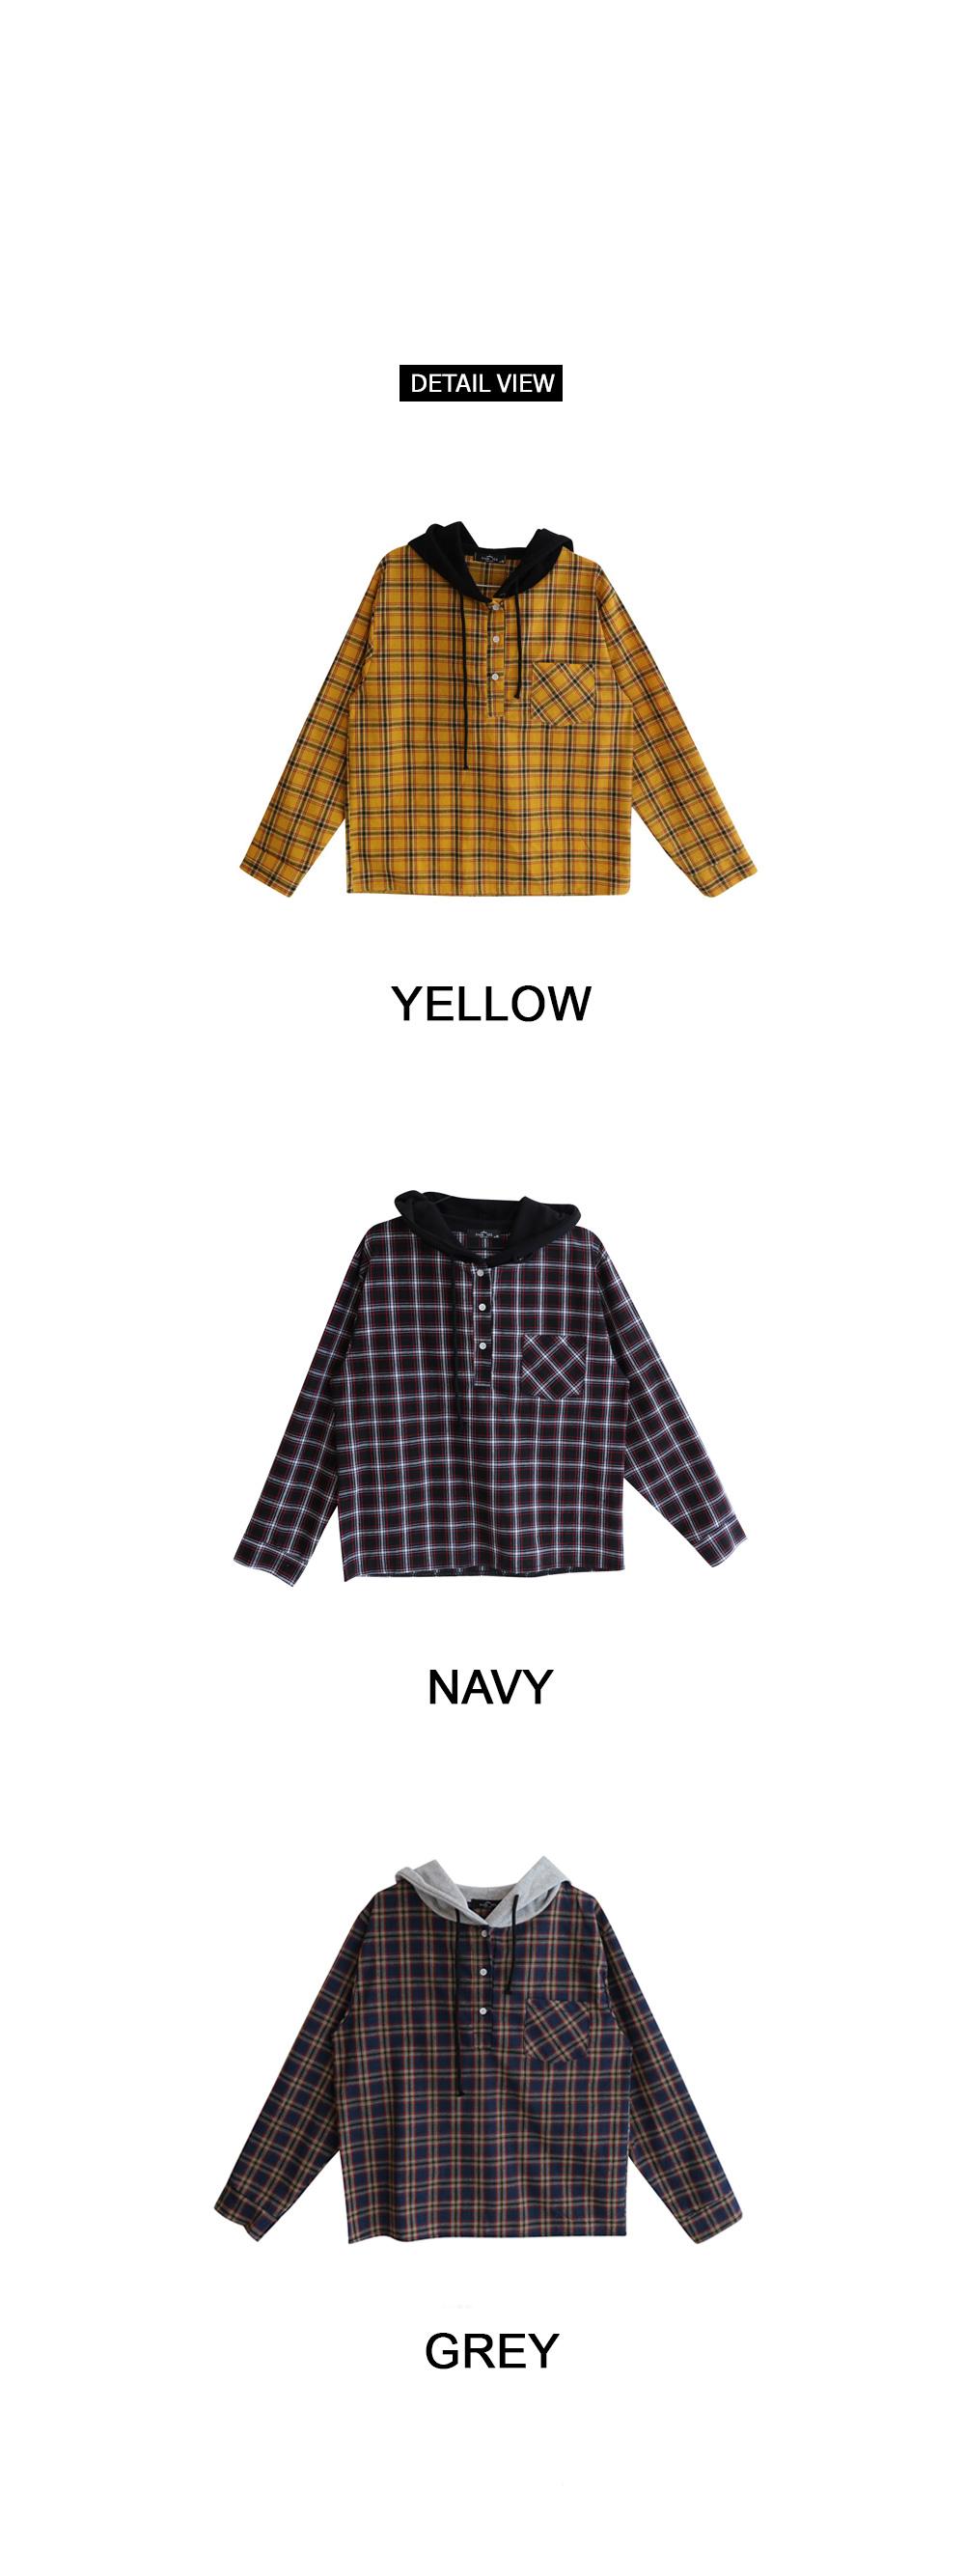 Wing Hood Check Southern Shirt